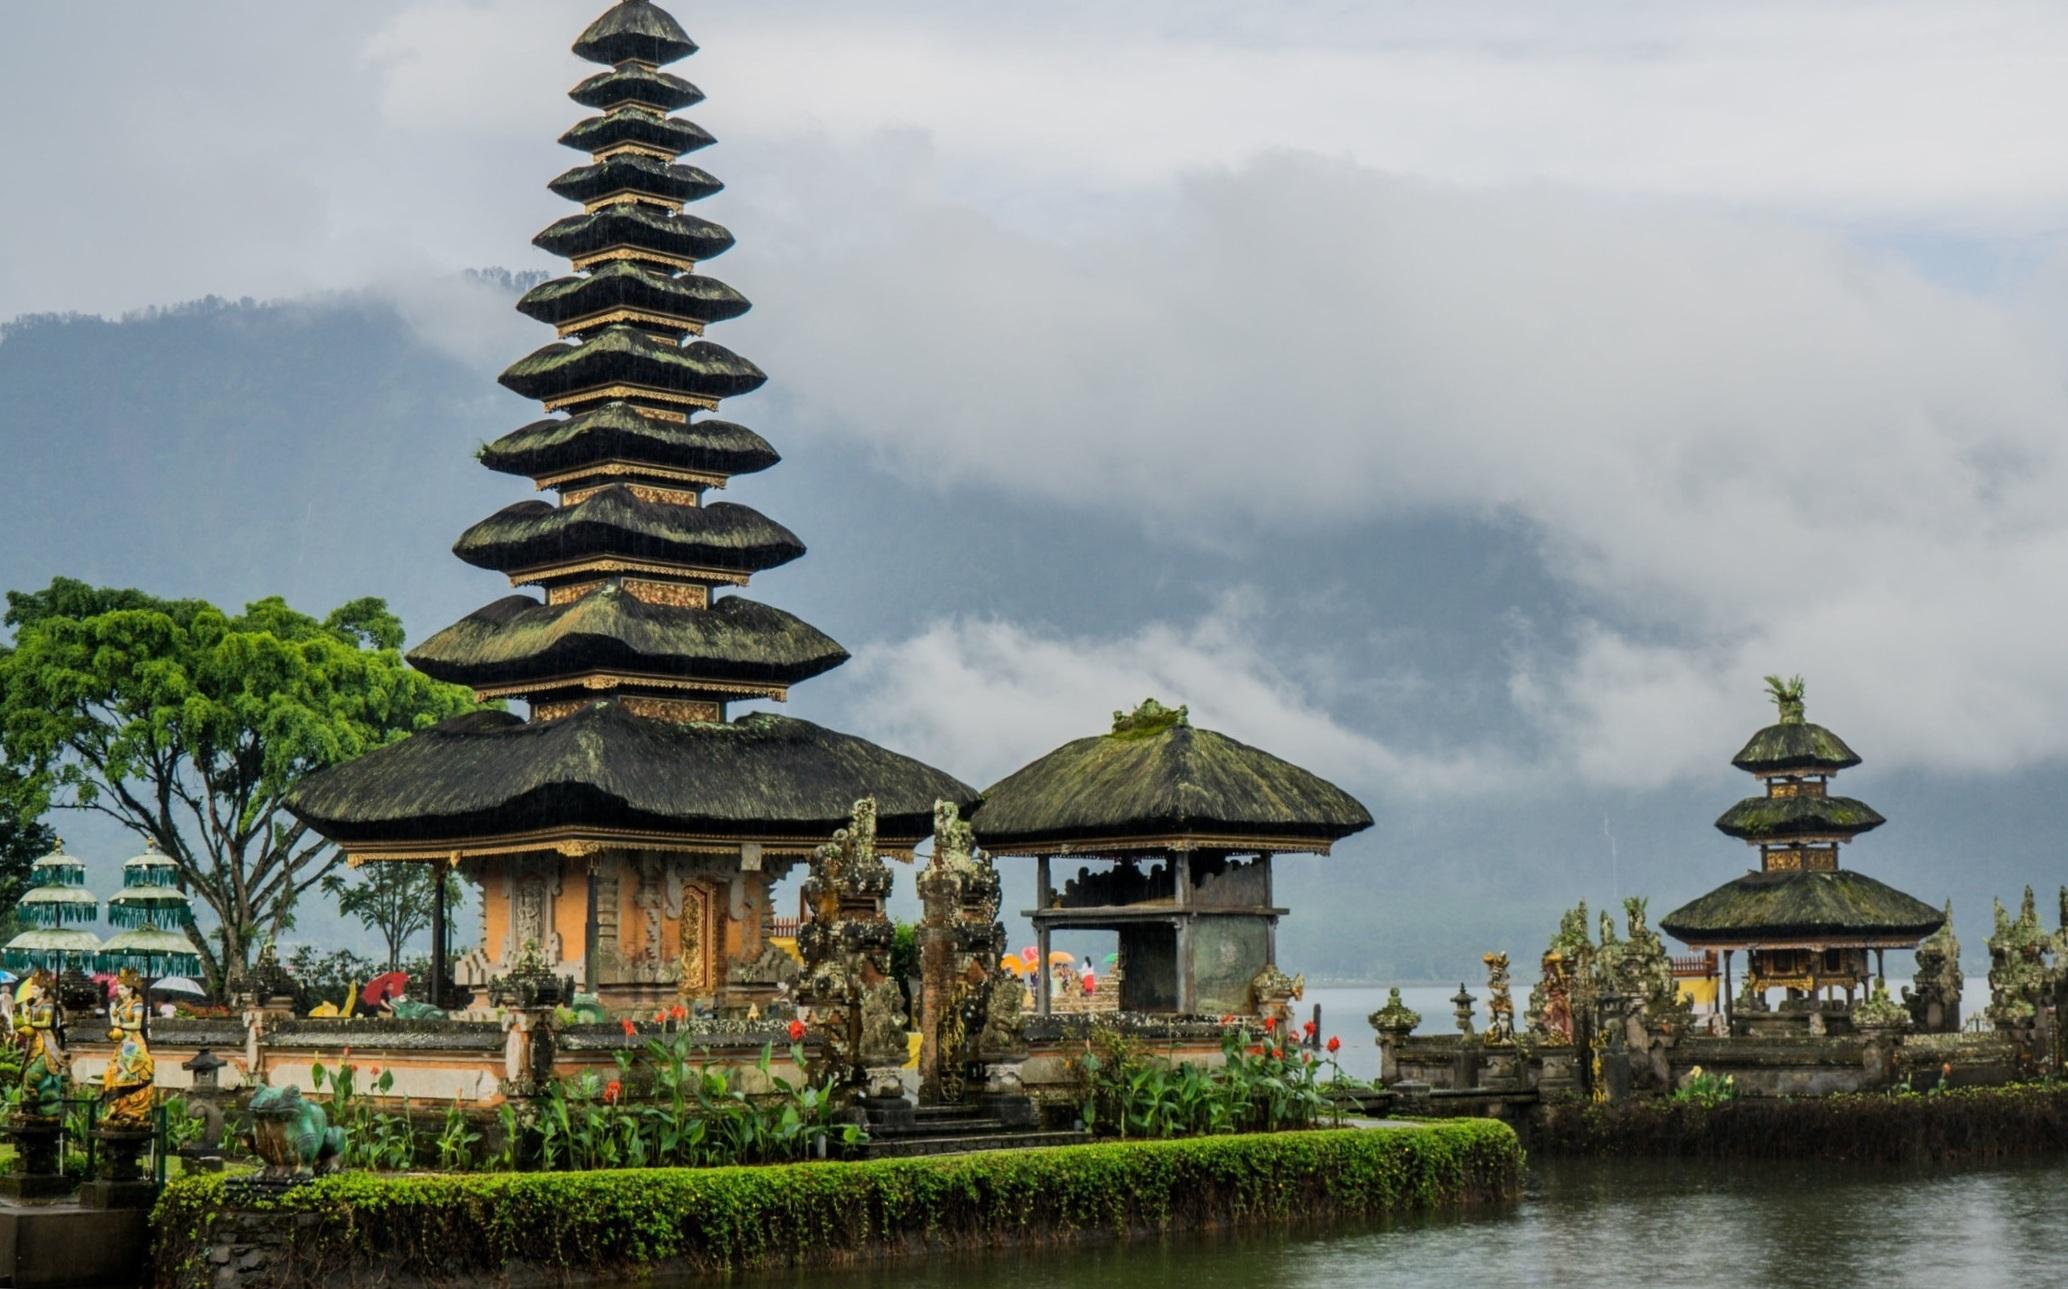 ITN Indonesia: Bali - Jl. Tari Kecak No. 12 Gatot Subroto Timur 80239 Denpasar, BaliIndonesia+62 361 426 724info@itnusa.com